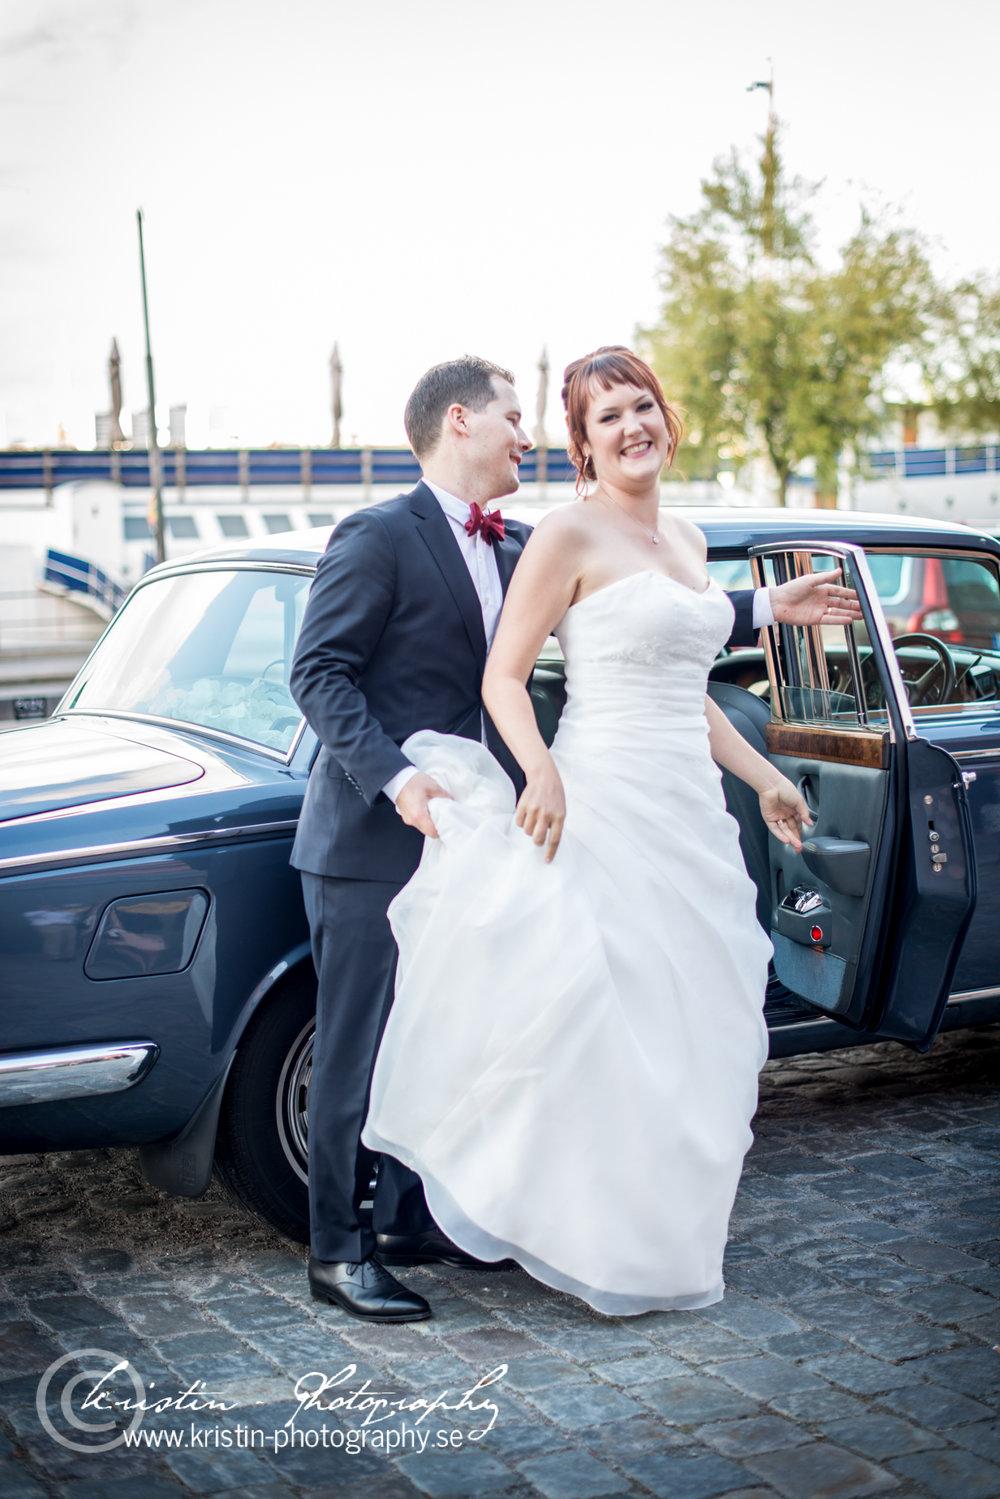 Bröllopsfotograf i Stockholm, Kristin - Photography , Munchen Bryggeriet-251.jpg